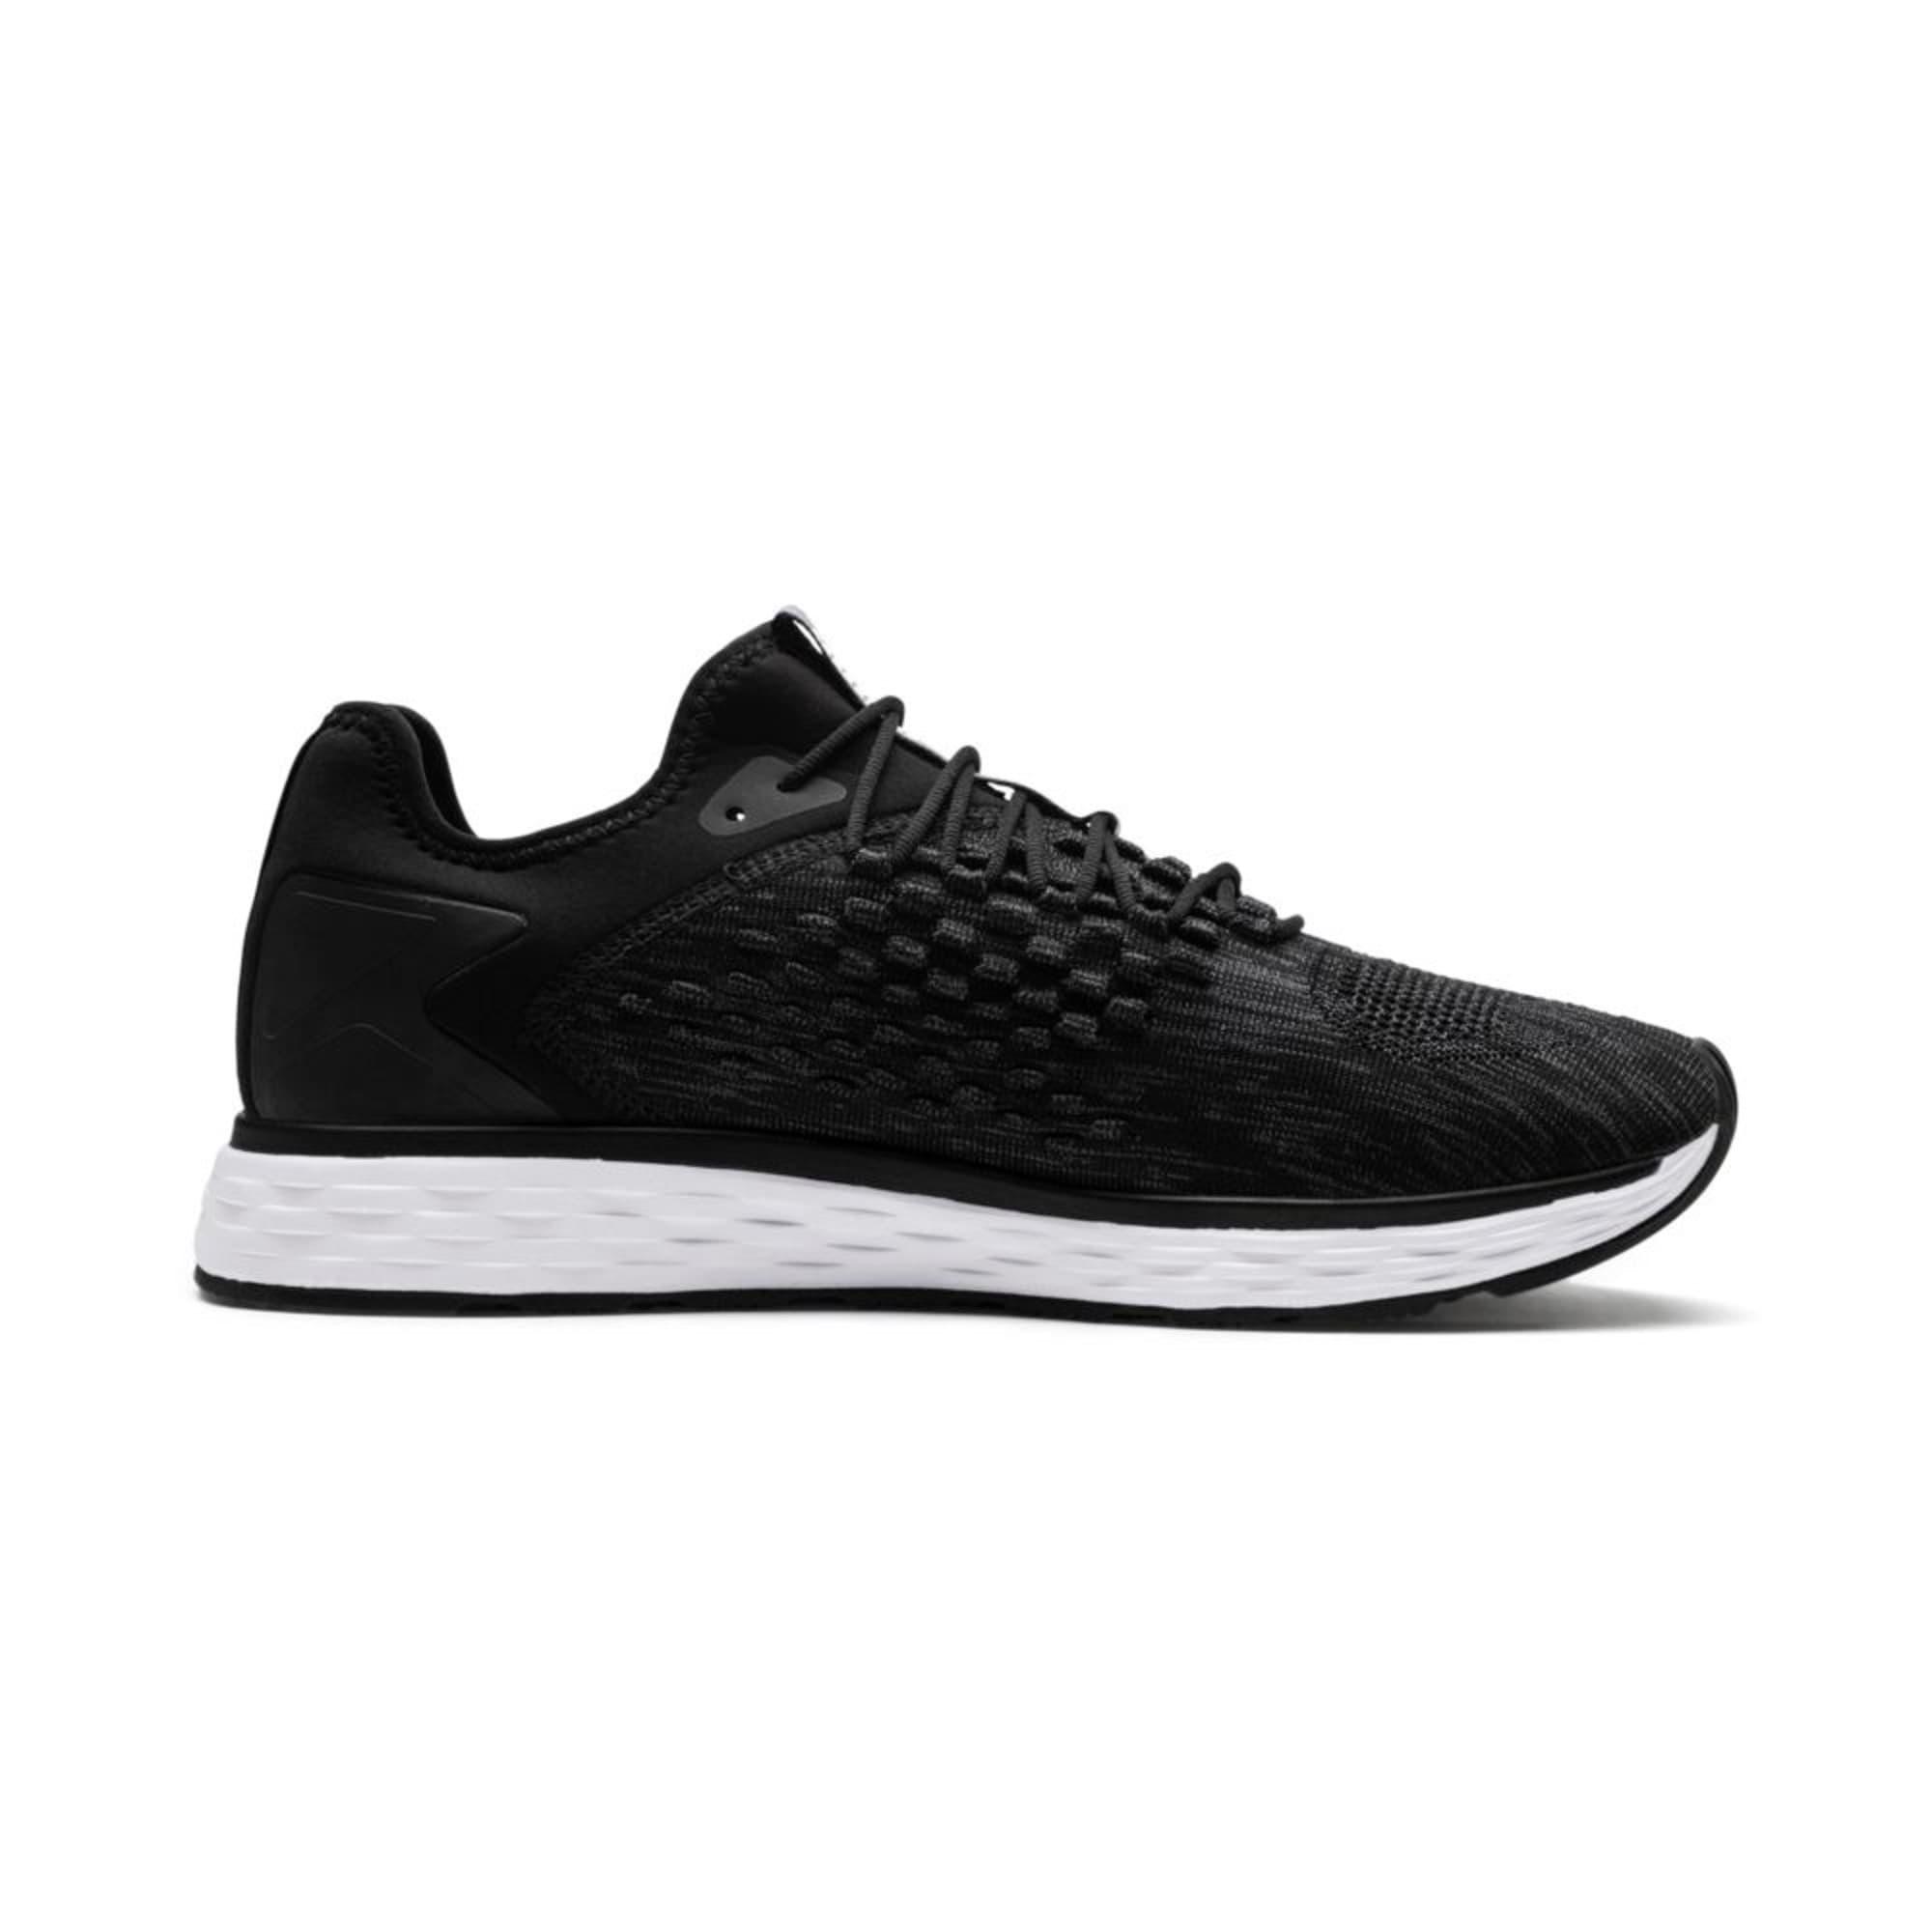 Thumbnail 2 of SPEED FUSEFIT Men's Running Shoes, Puma Black-Iron Gate, medium-IND